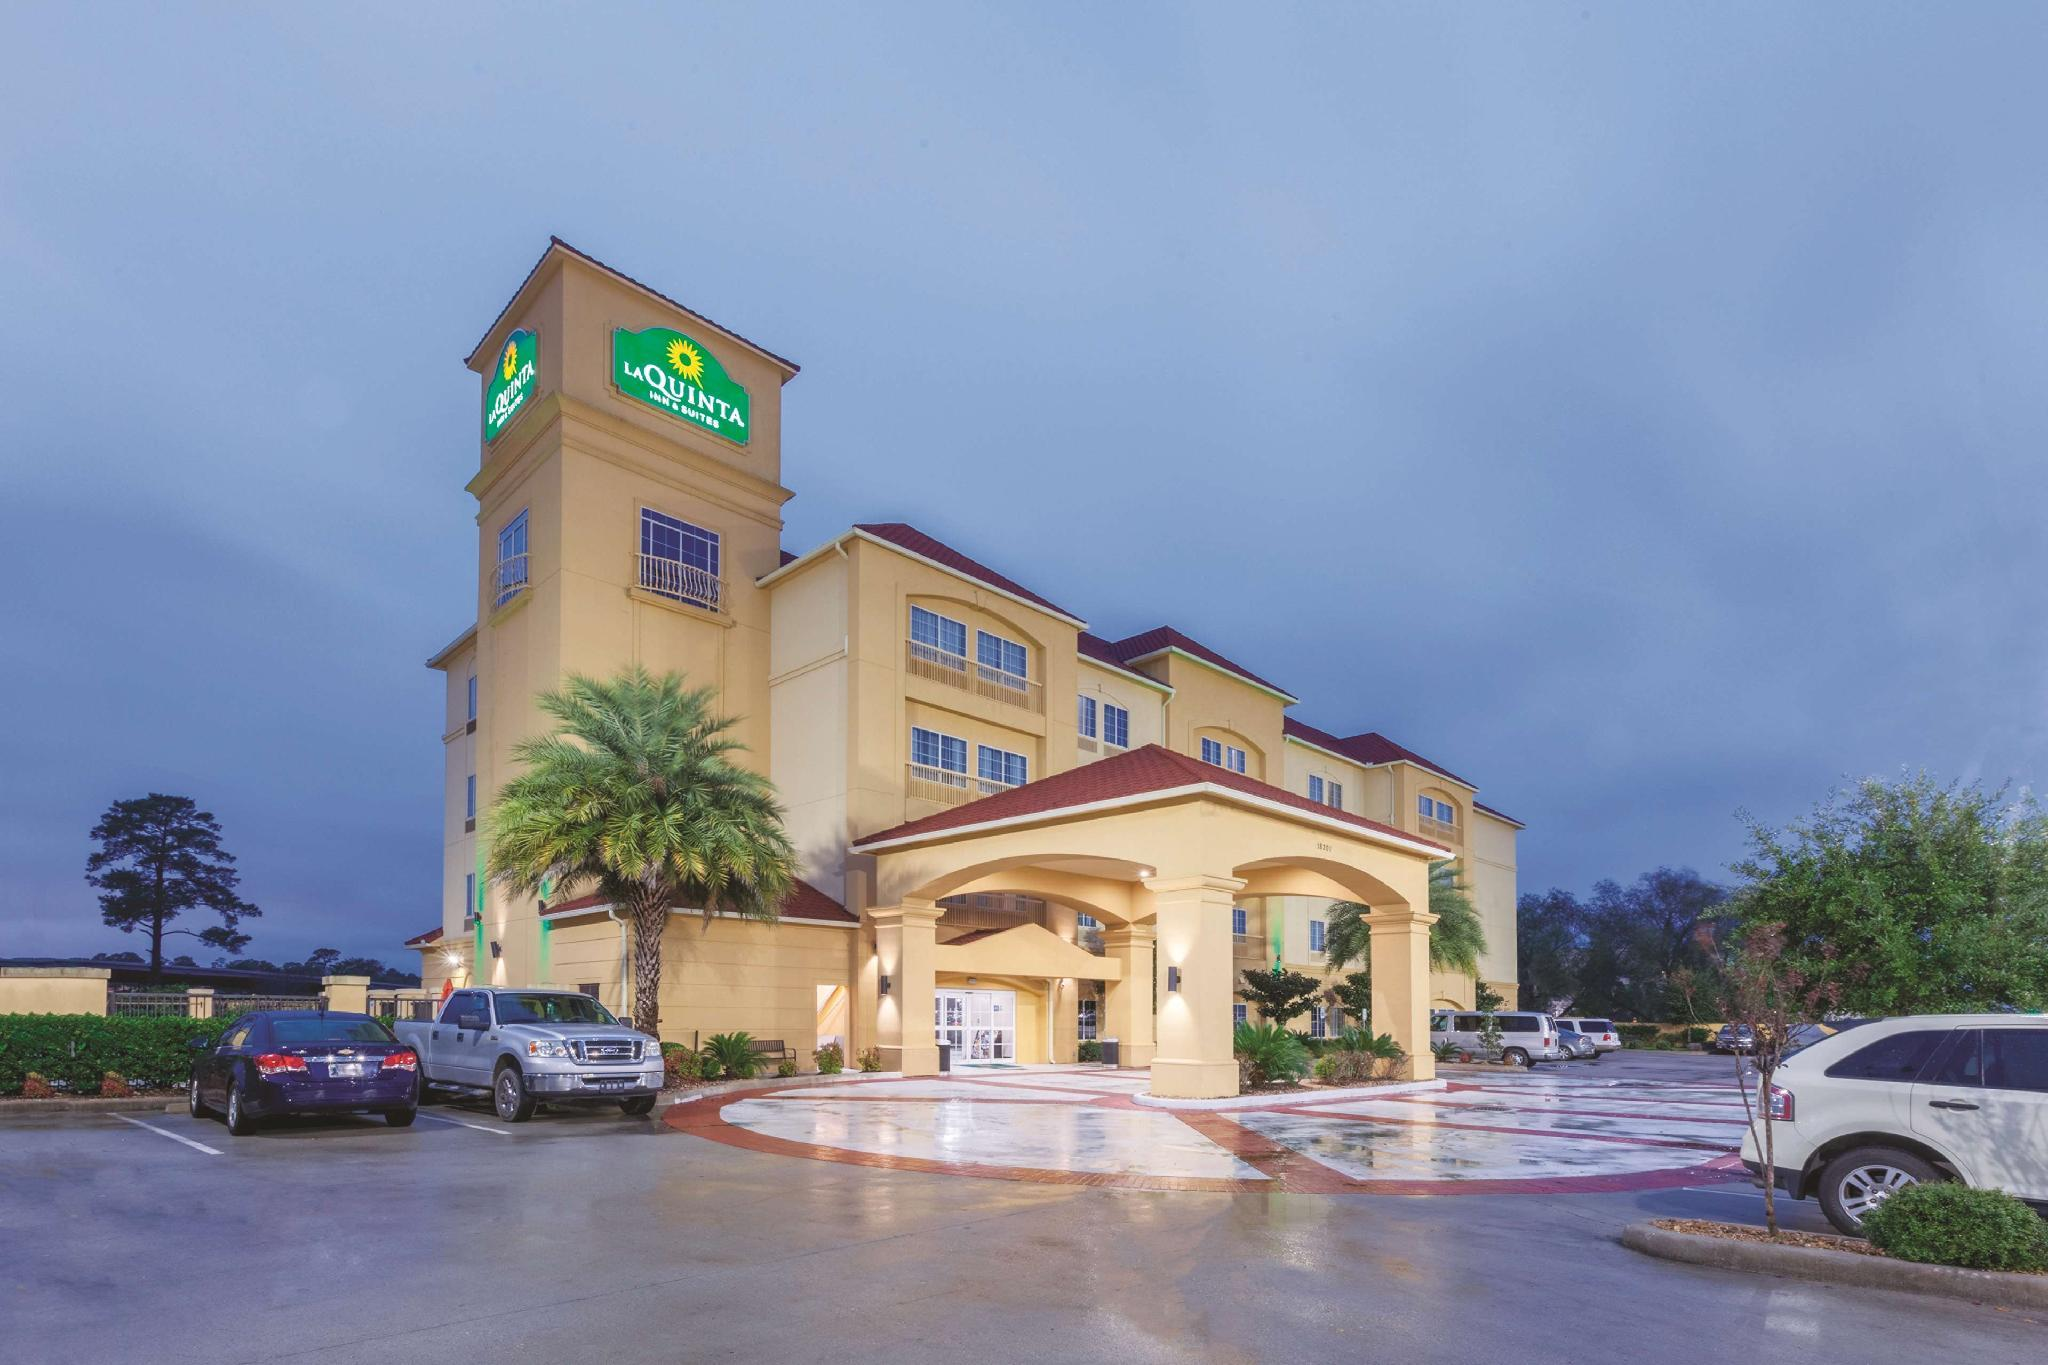 La Quinta Inn And Suites By Wyndham Houston Bush Intl Airpt E